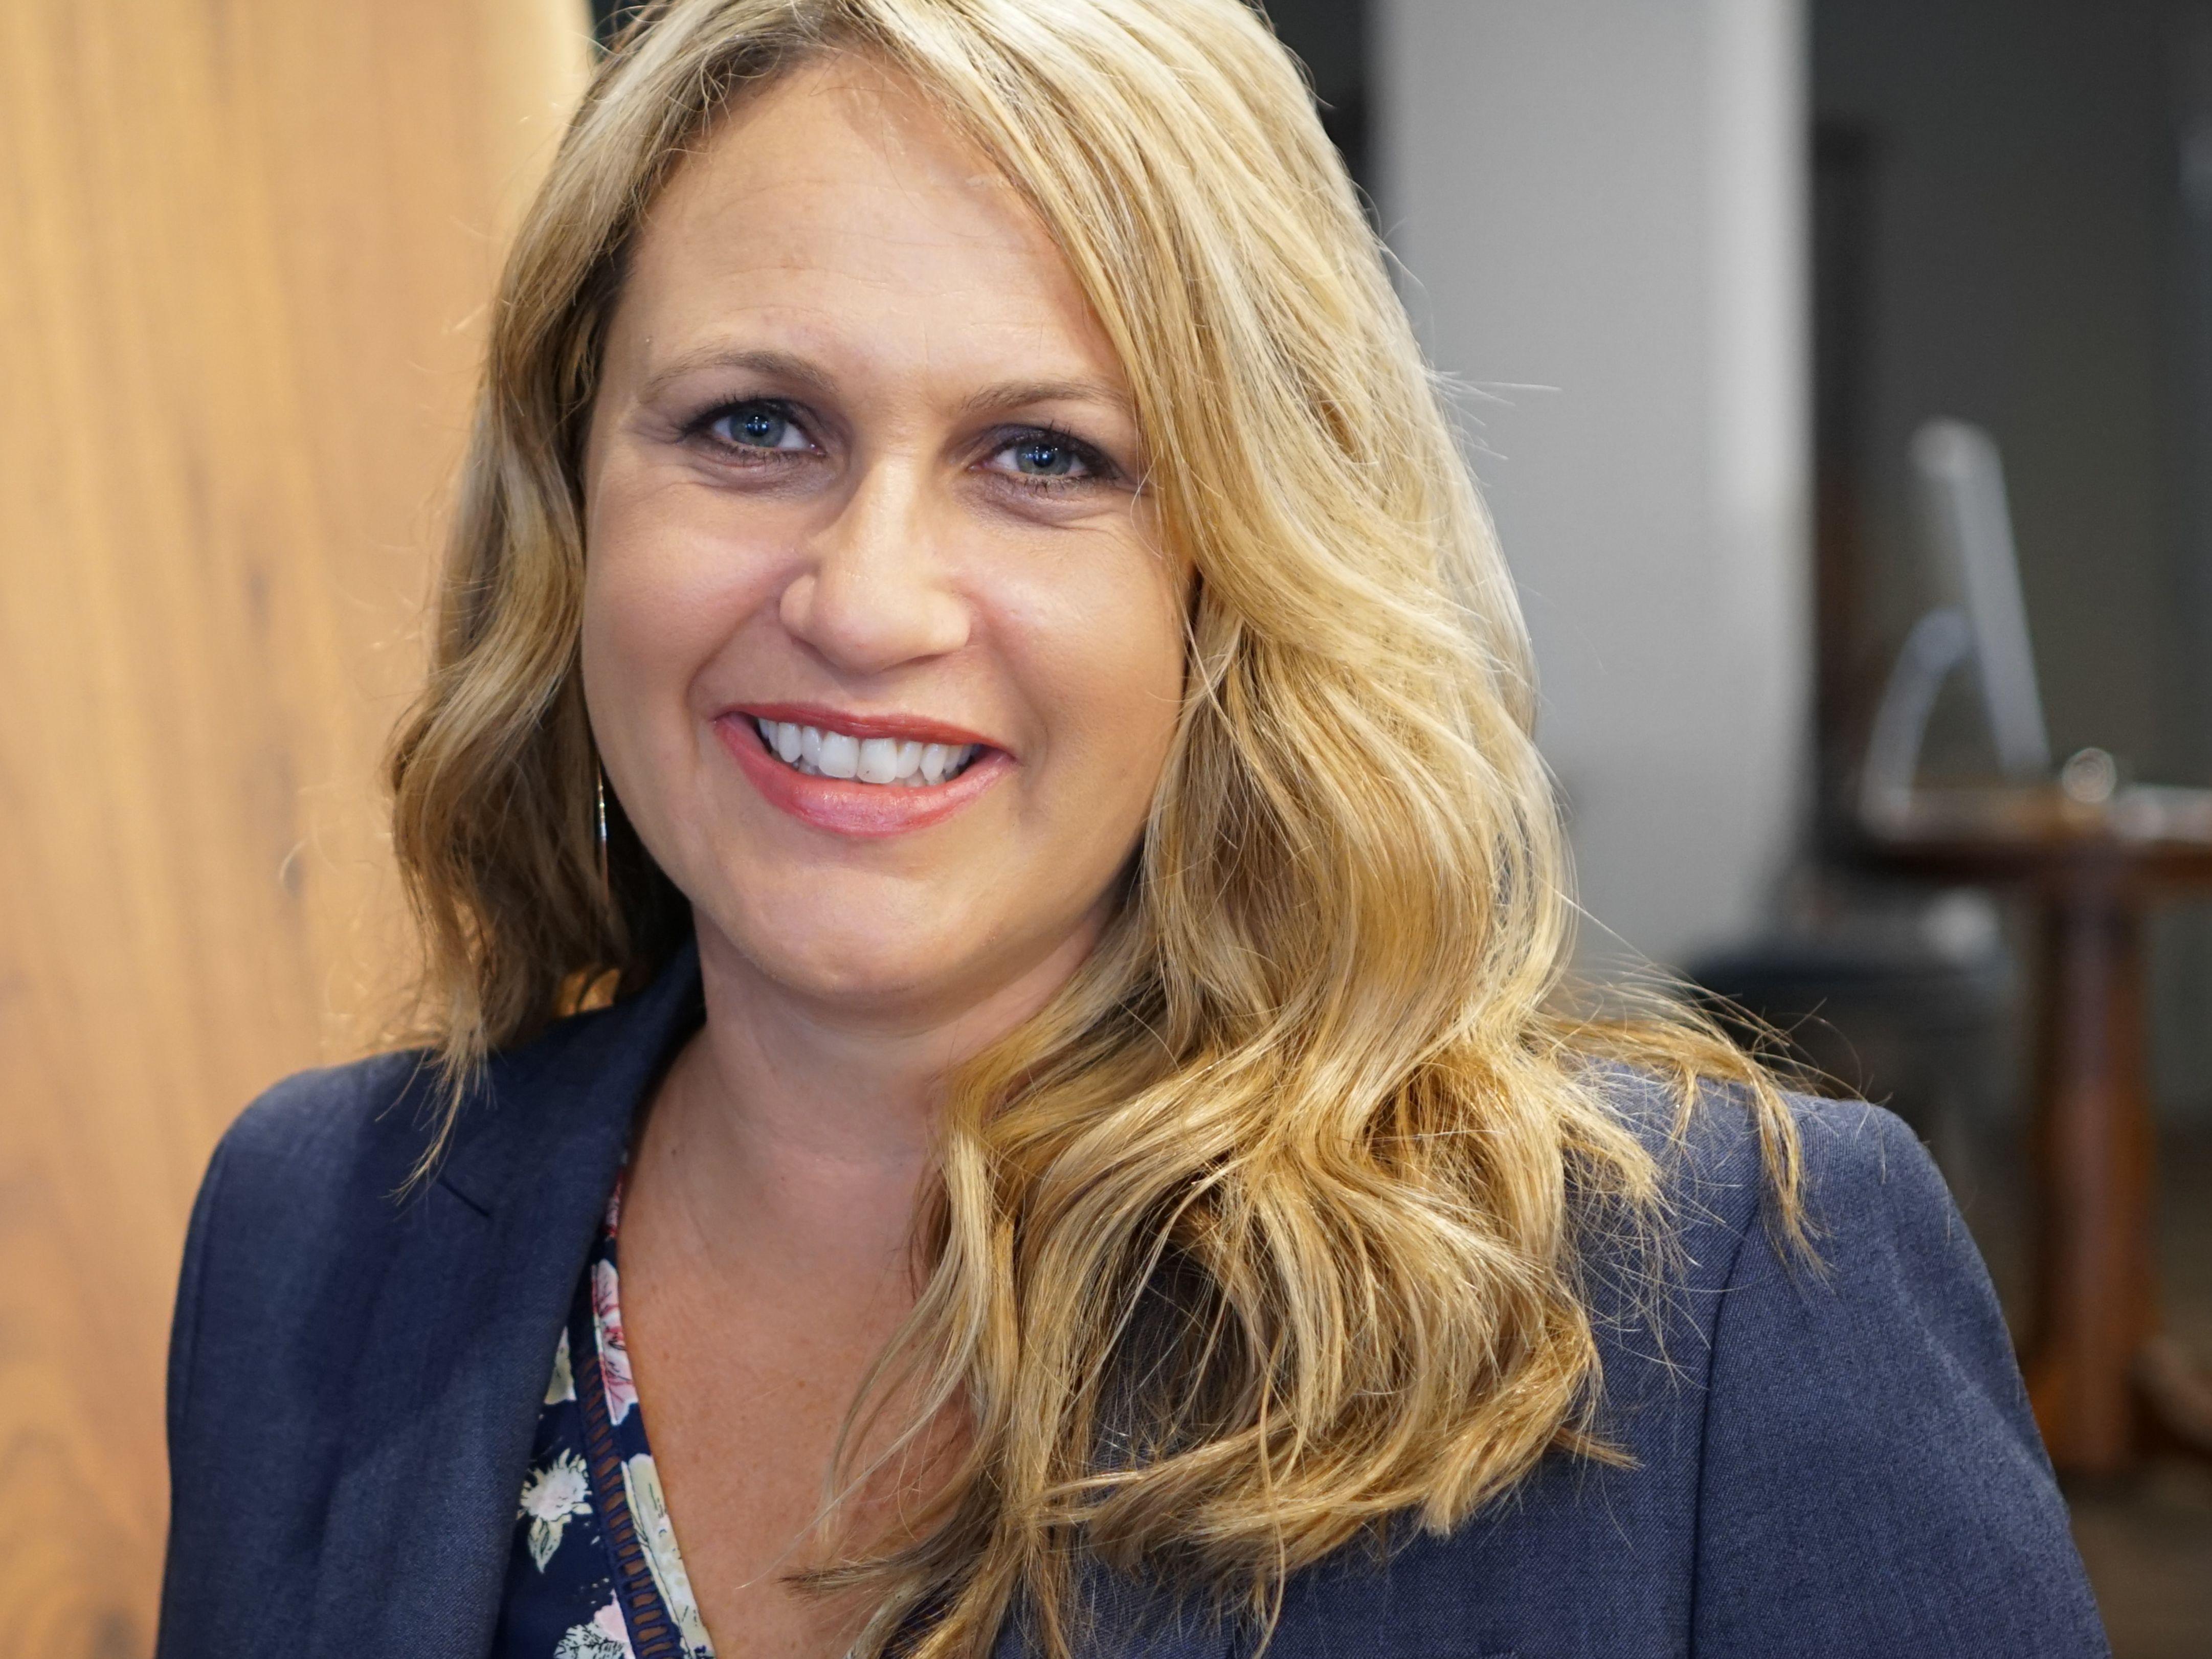 Amanda stutzman lvnibt